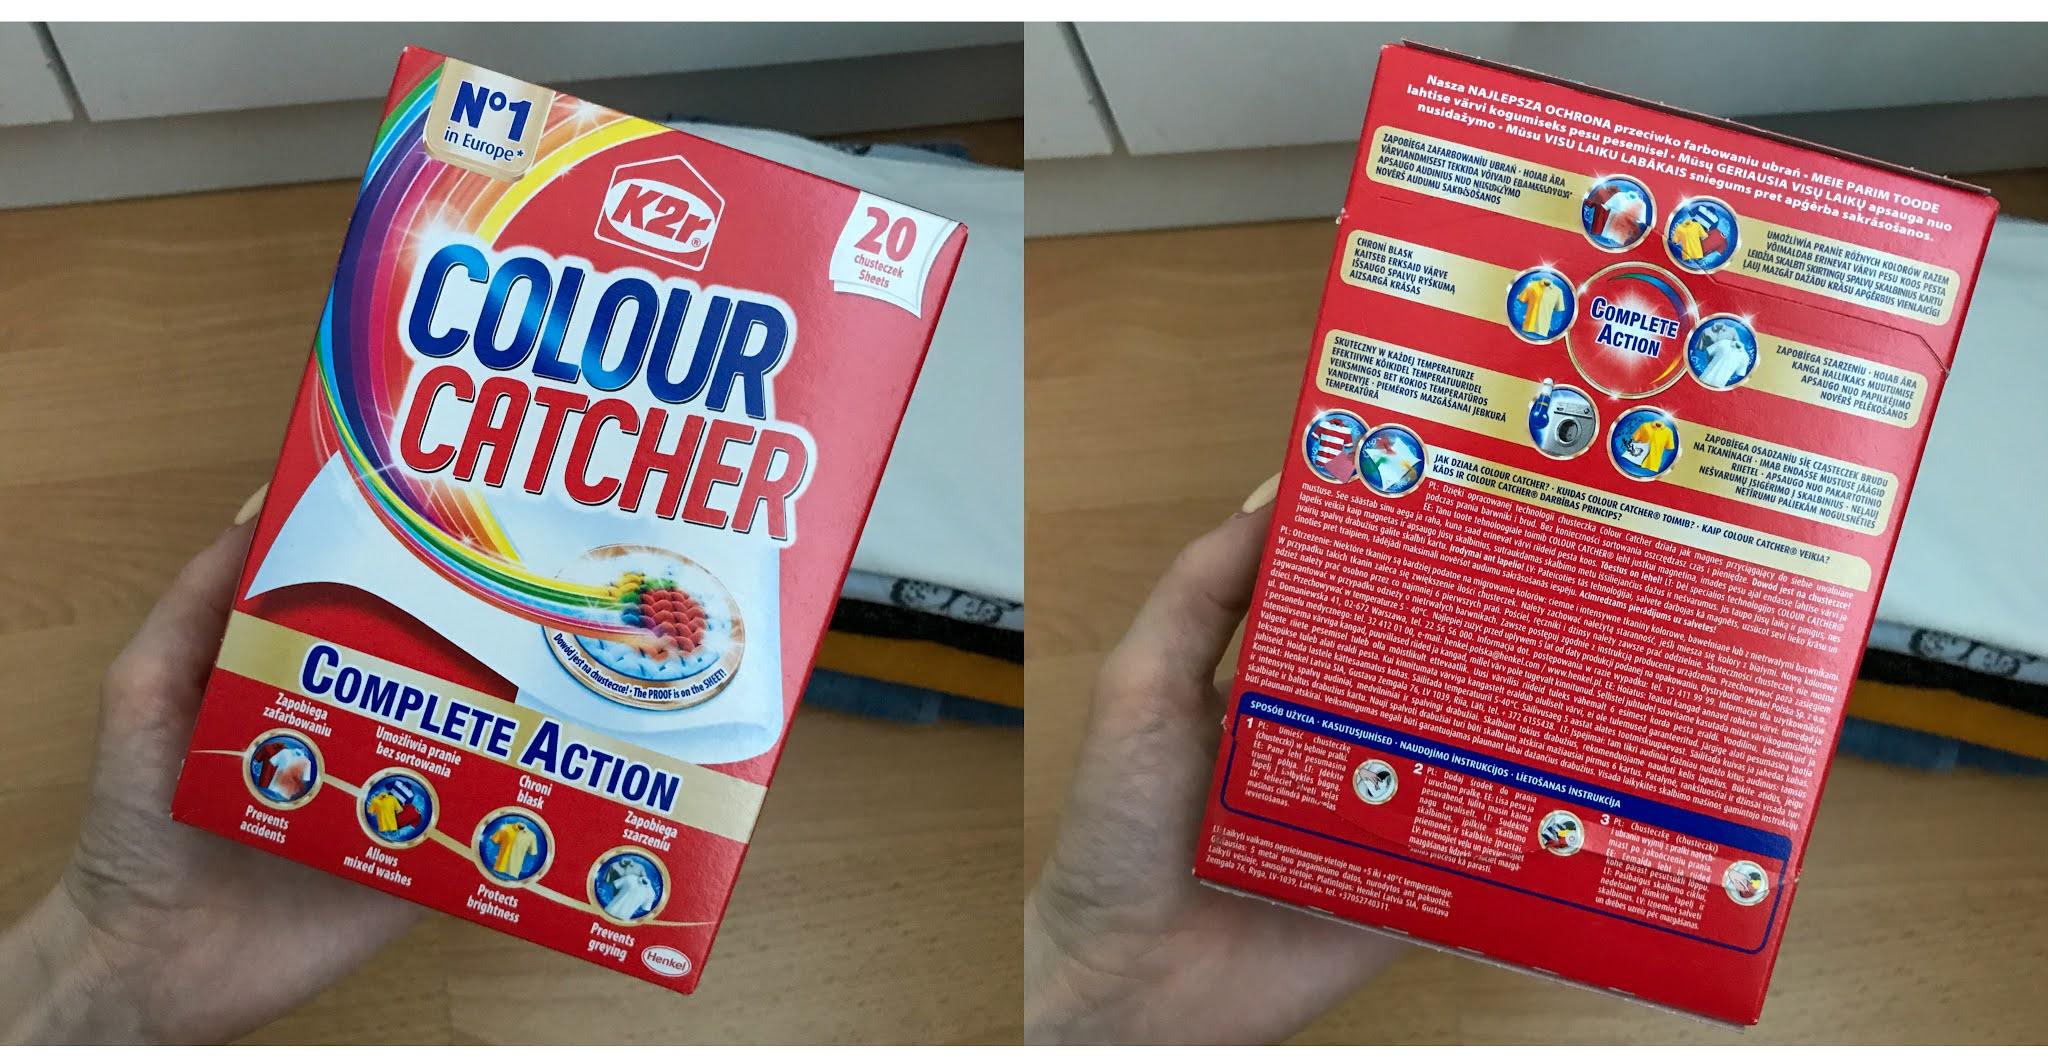 Chusteczki wyłapujące kolor Color Catcher od K2r. Projekt Trnd